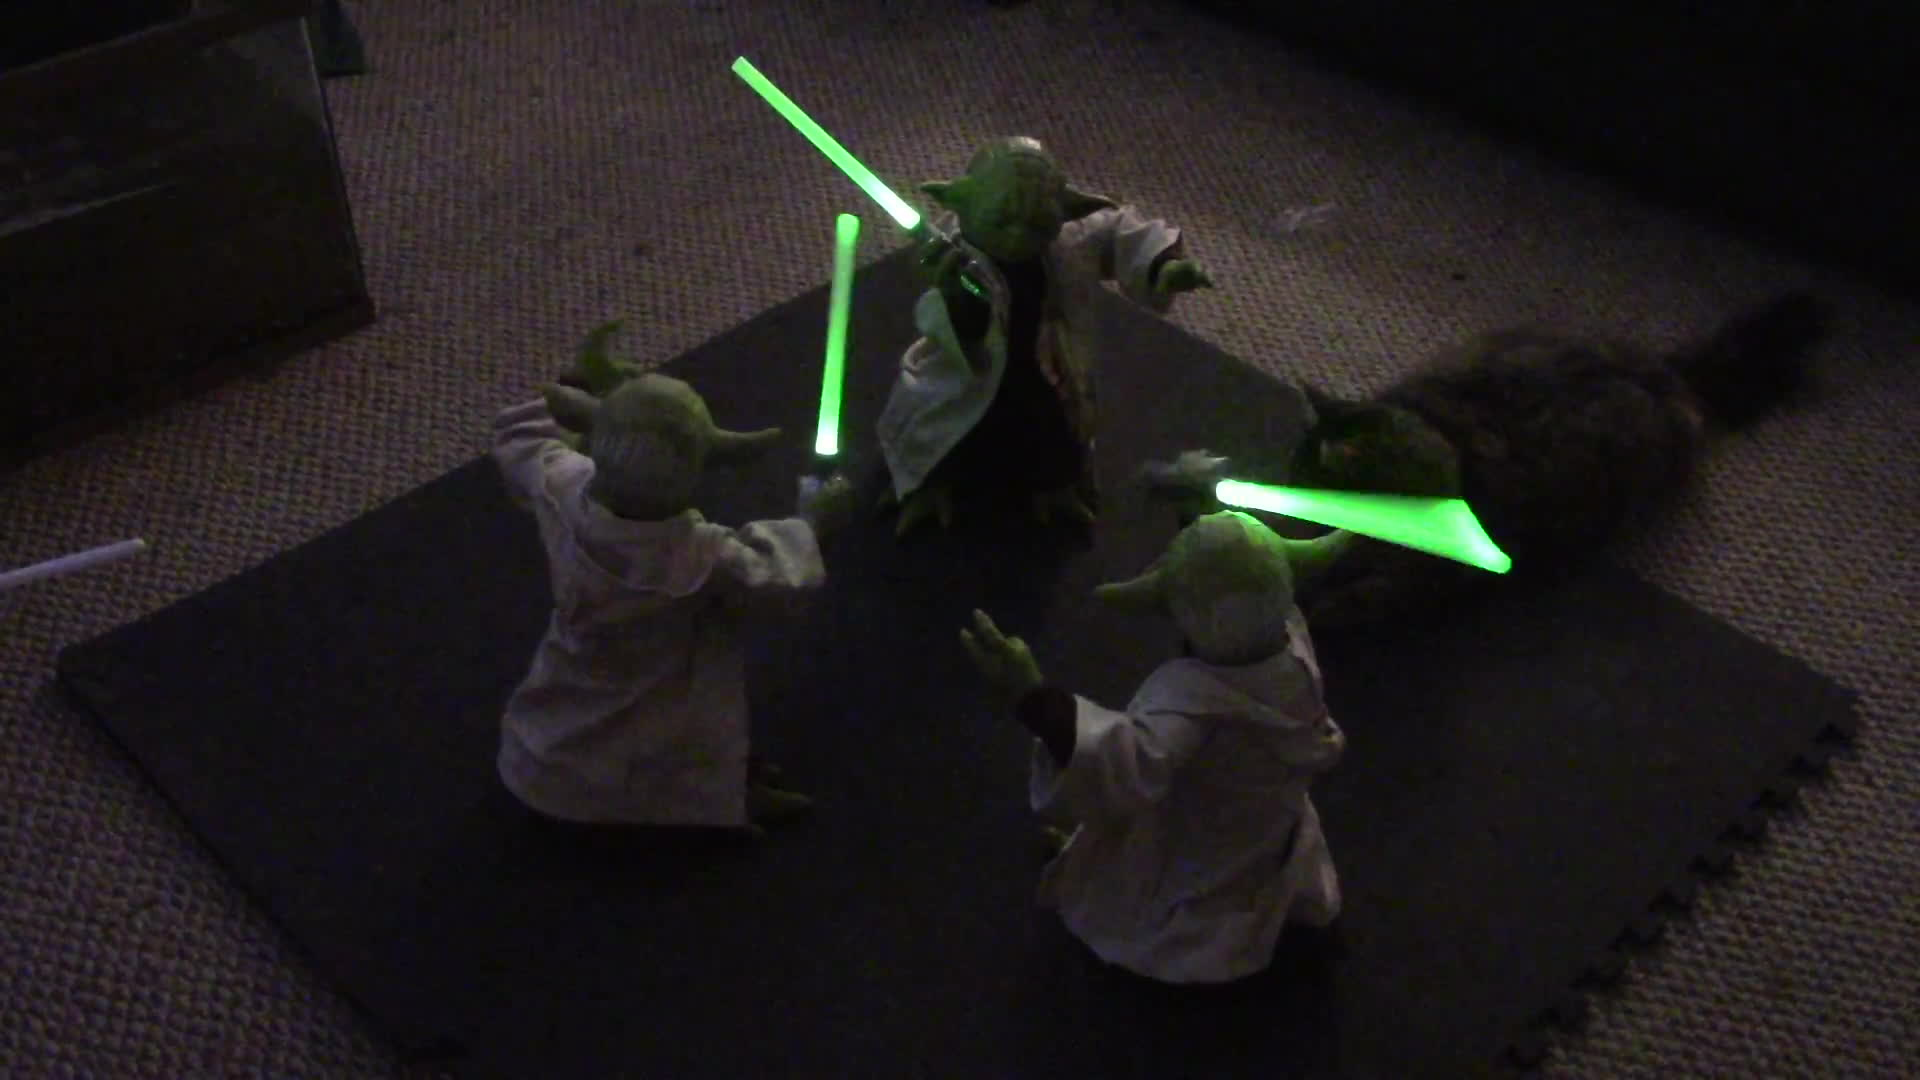 LatinoPeopleTwitter, mexico, Animatronic Legendary Yoda Battle, 3x Yoda! GIFs